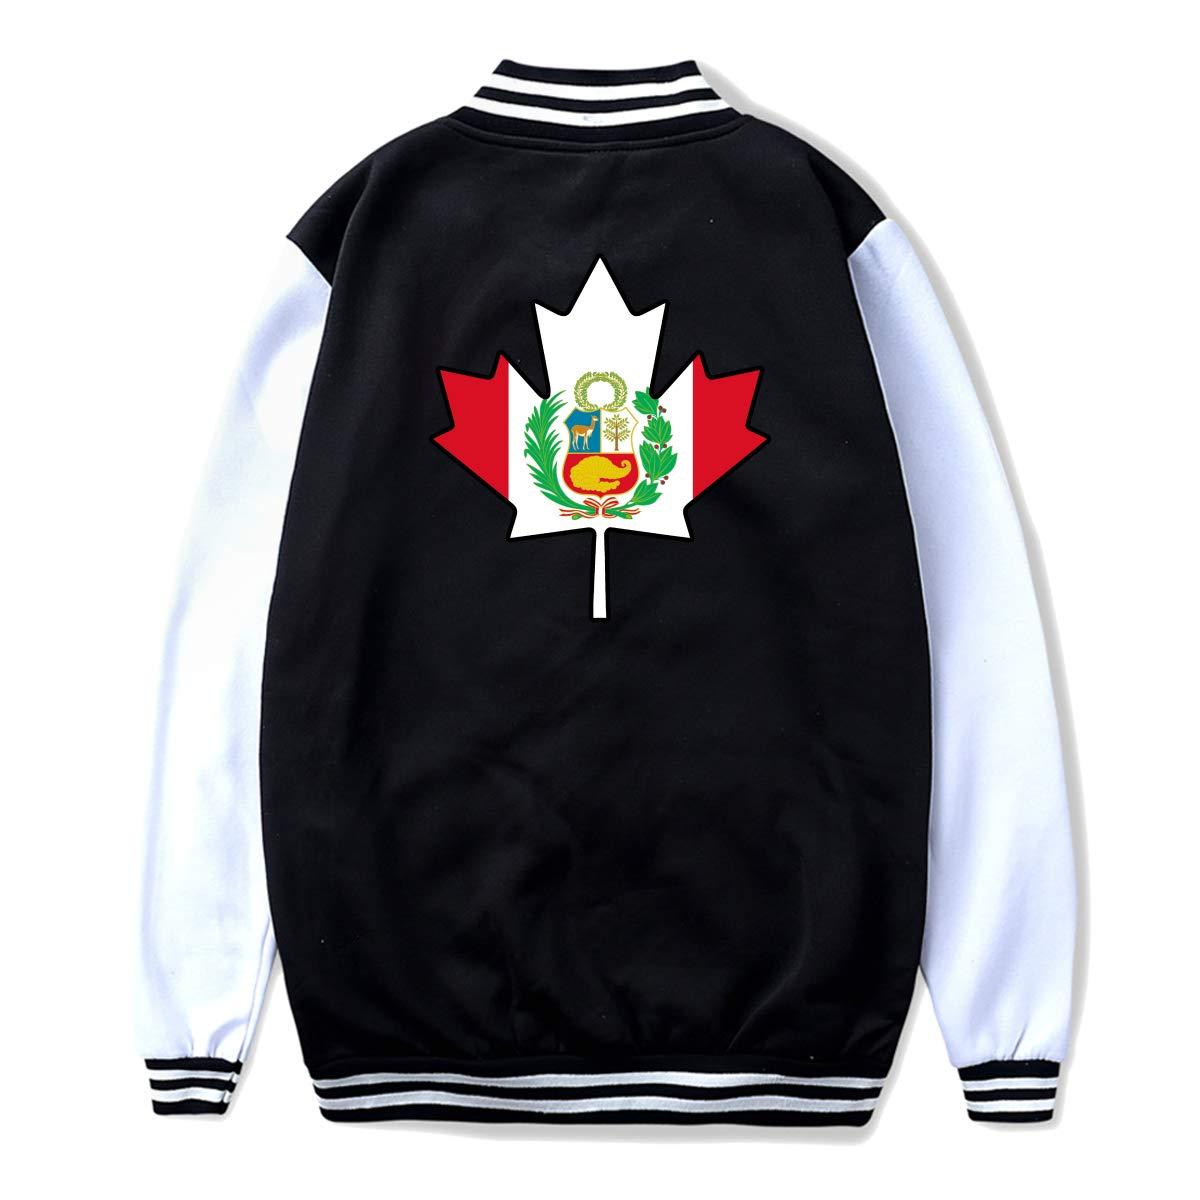 Back Print Unisex Youth Baseball Uniform Jacket Peru Flag Canada Maple Leaf Coat Sport Outfit